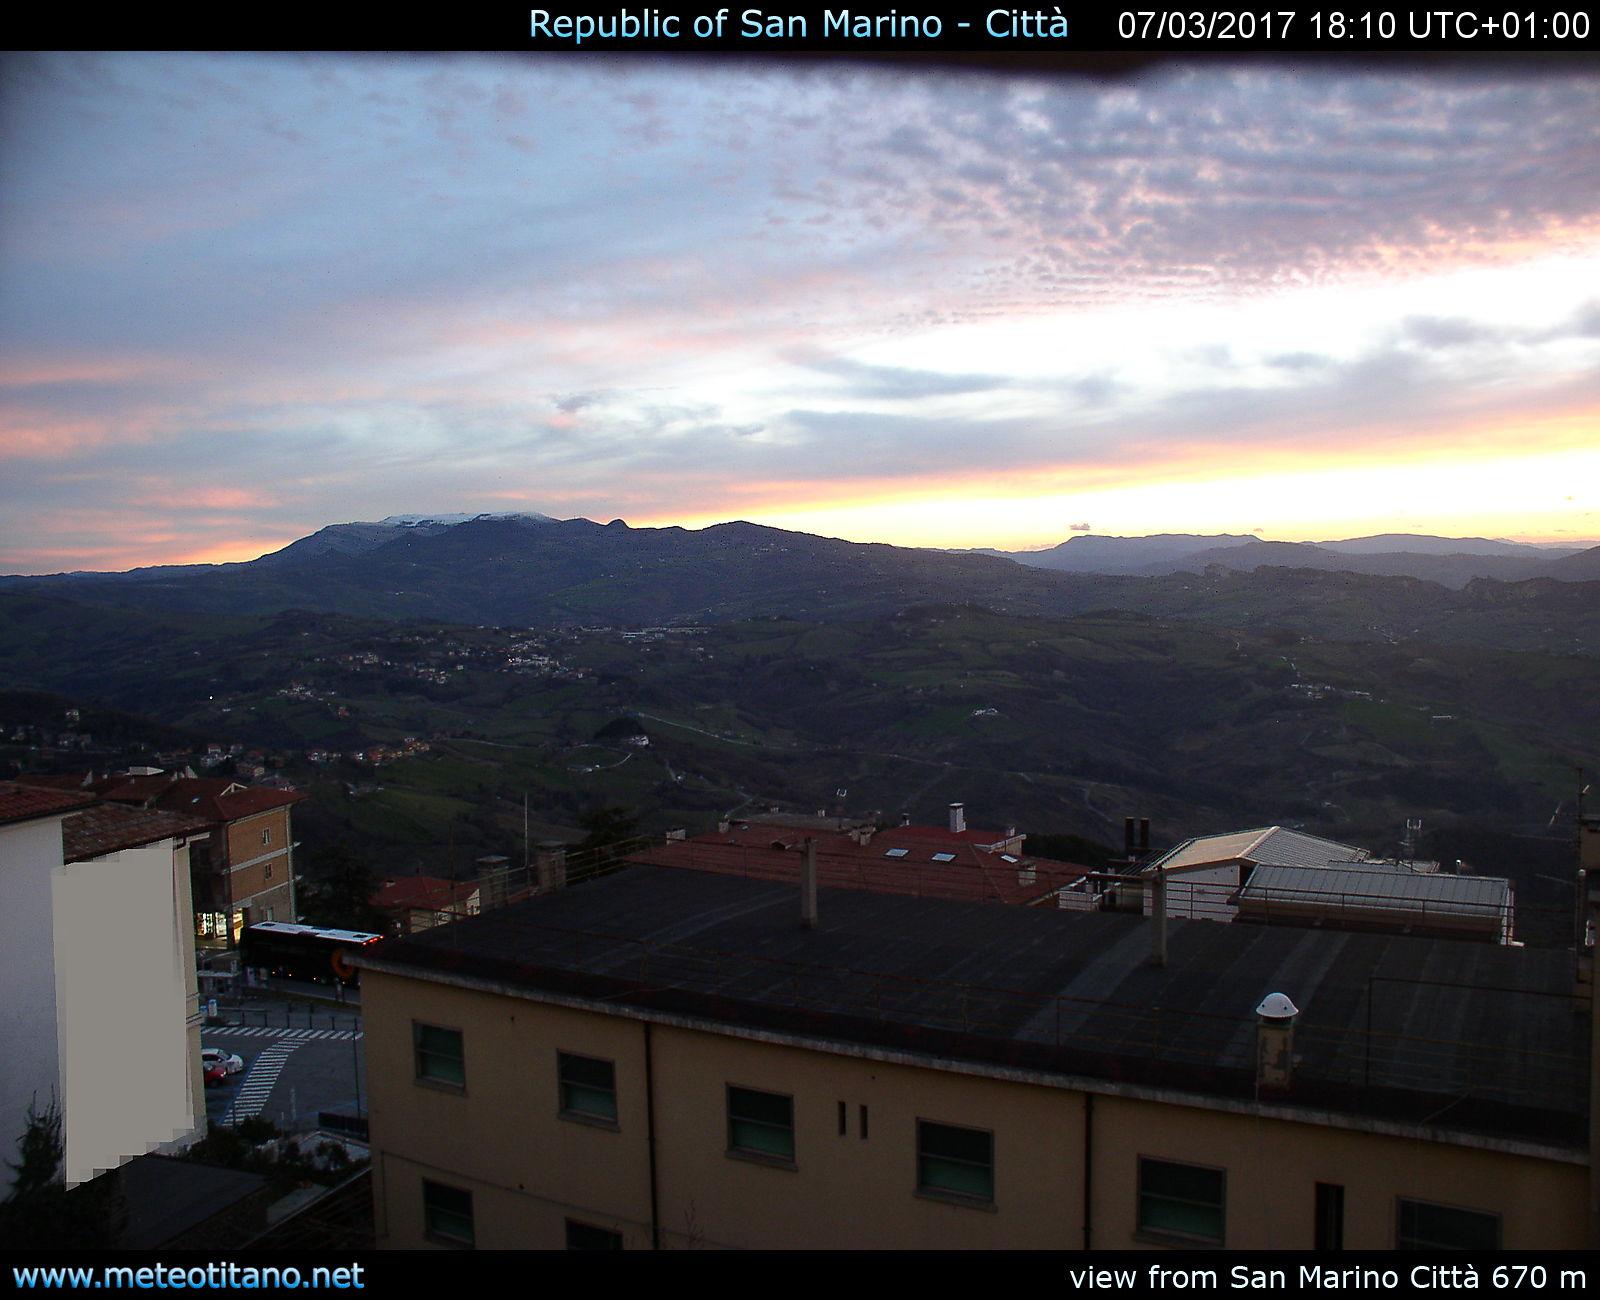 Romagna dal 06 al 12 marzo 2017-cam4.jpg